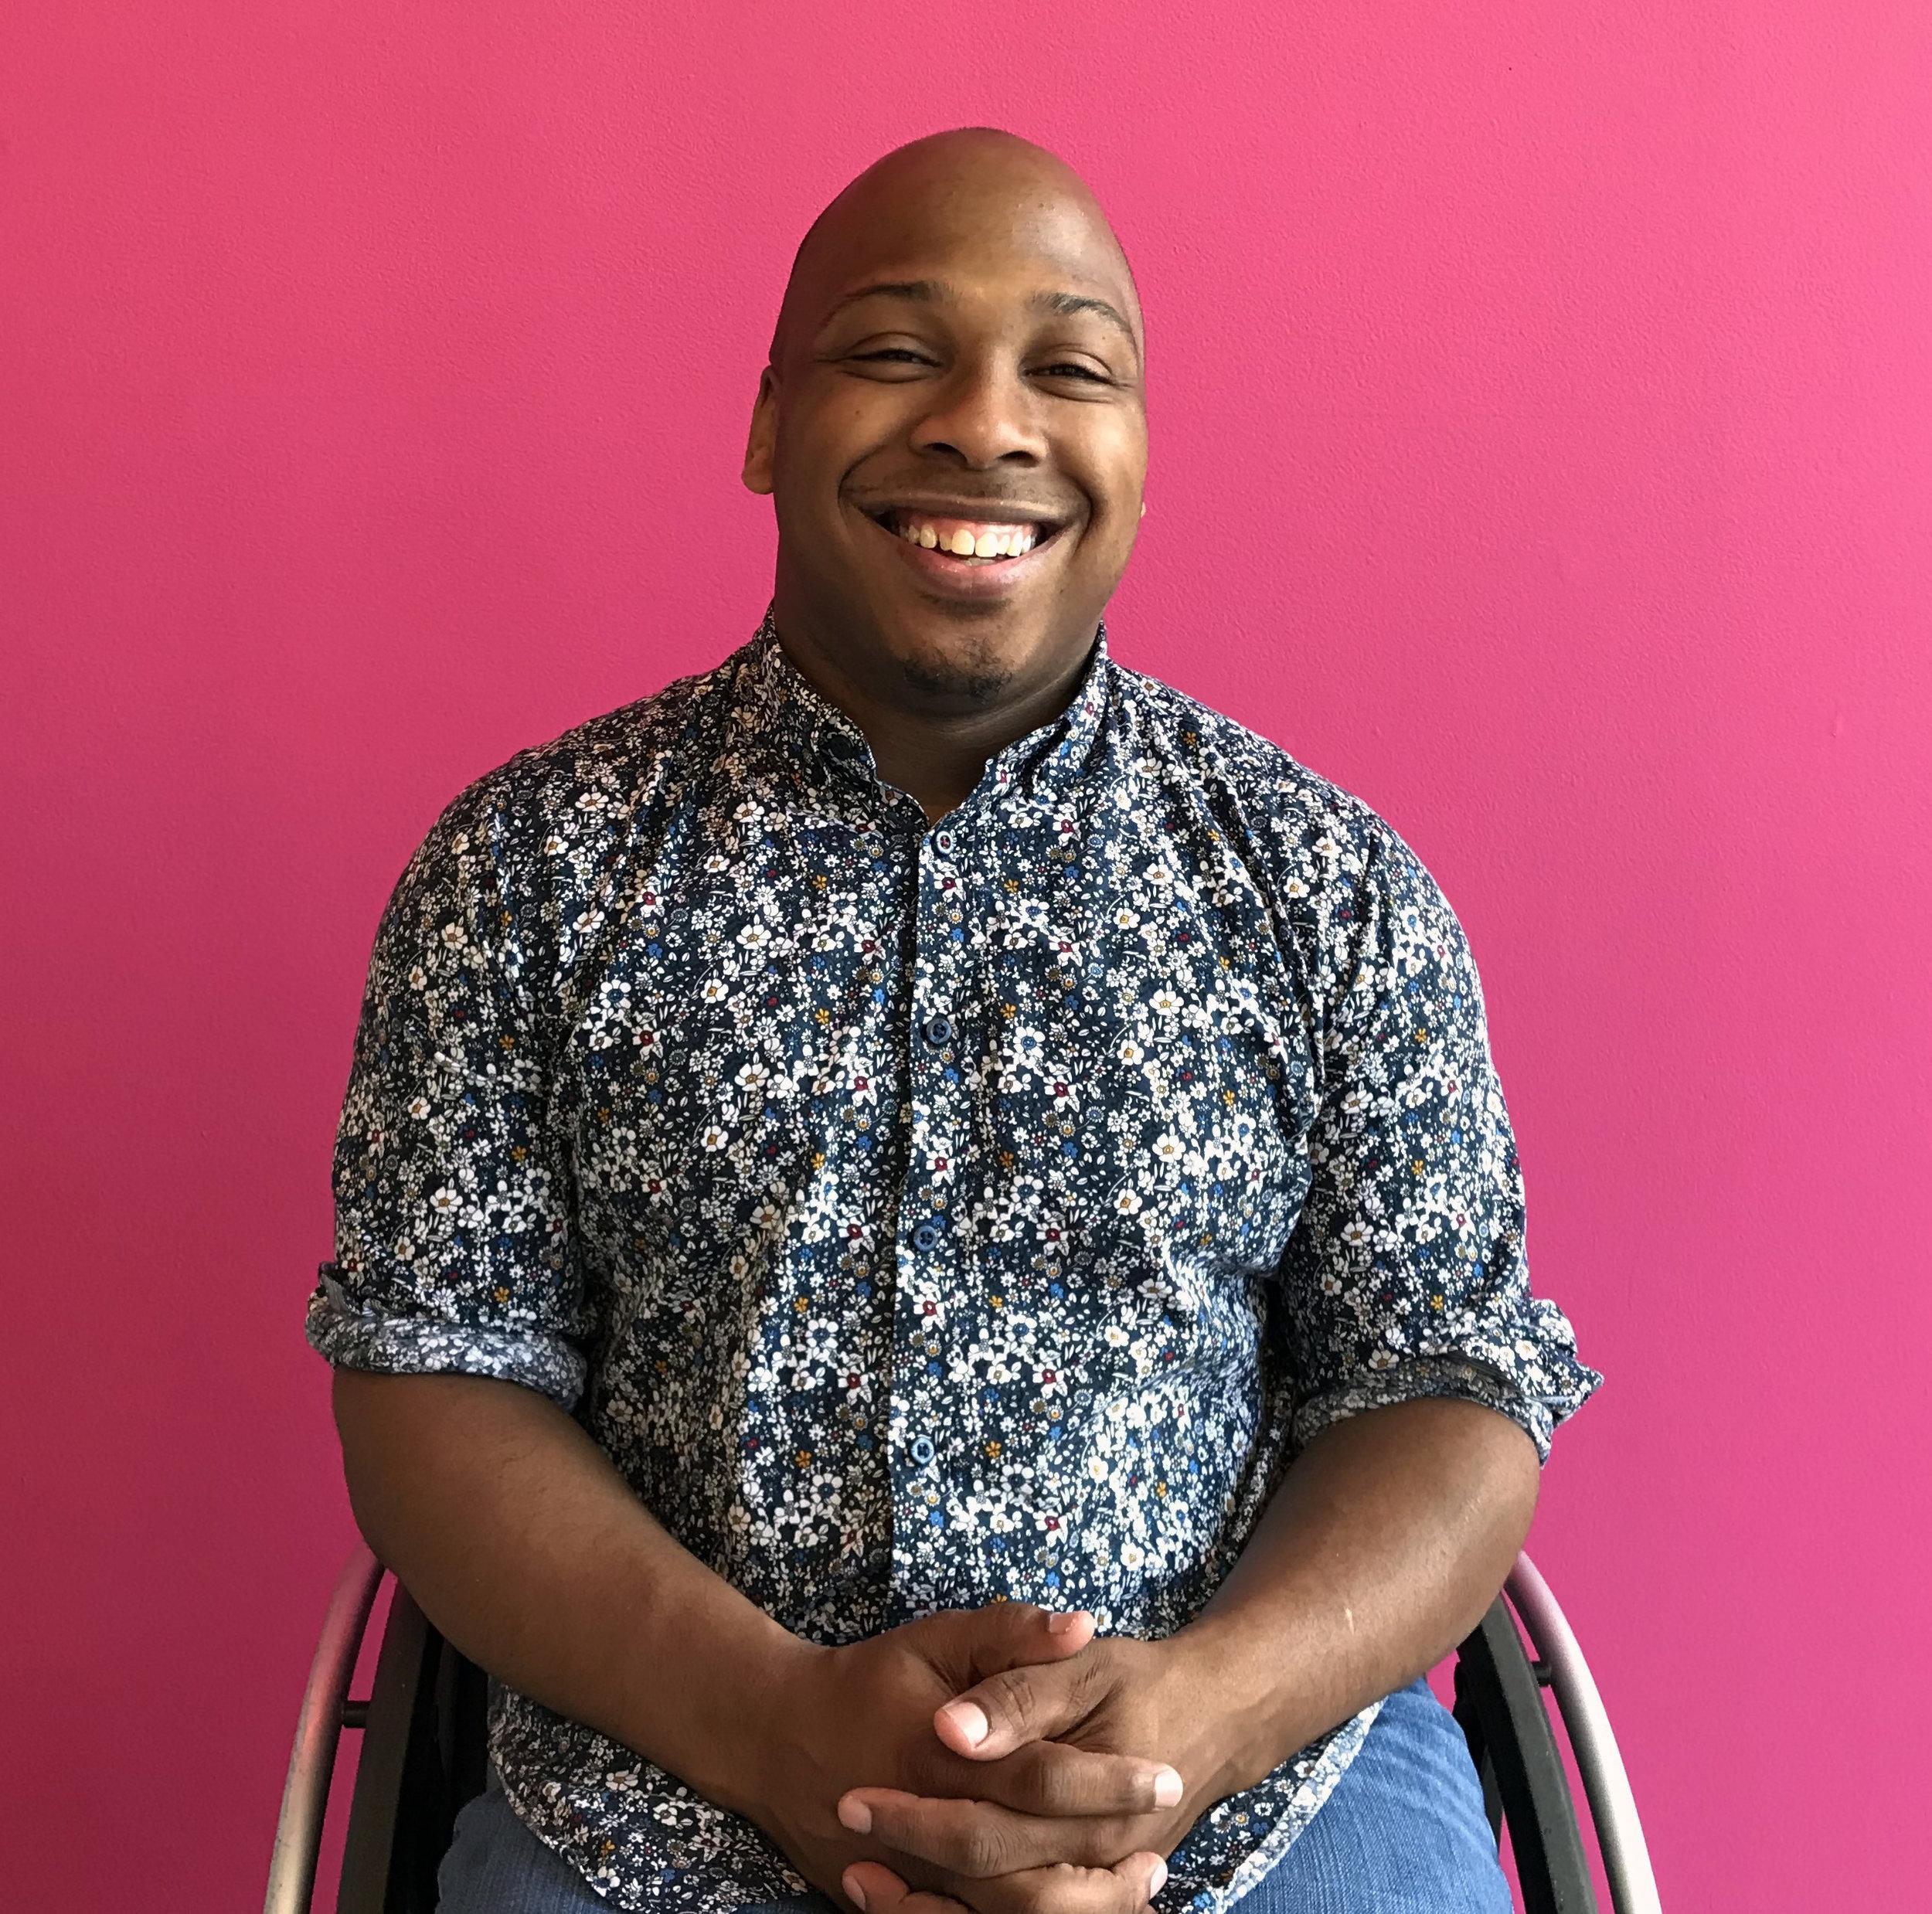 Patrick Williams, SPARKcon Access Coordinator